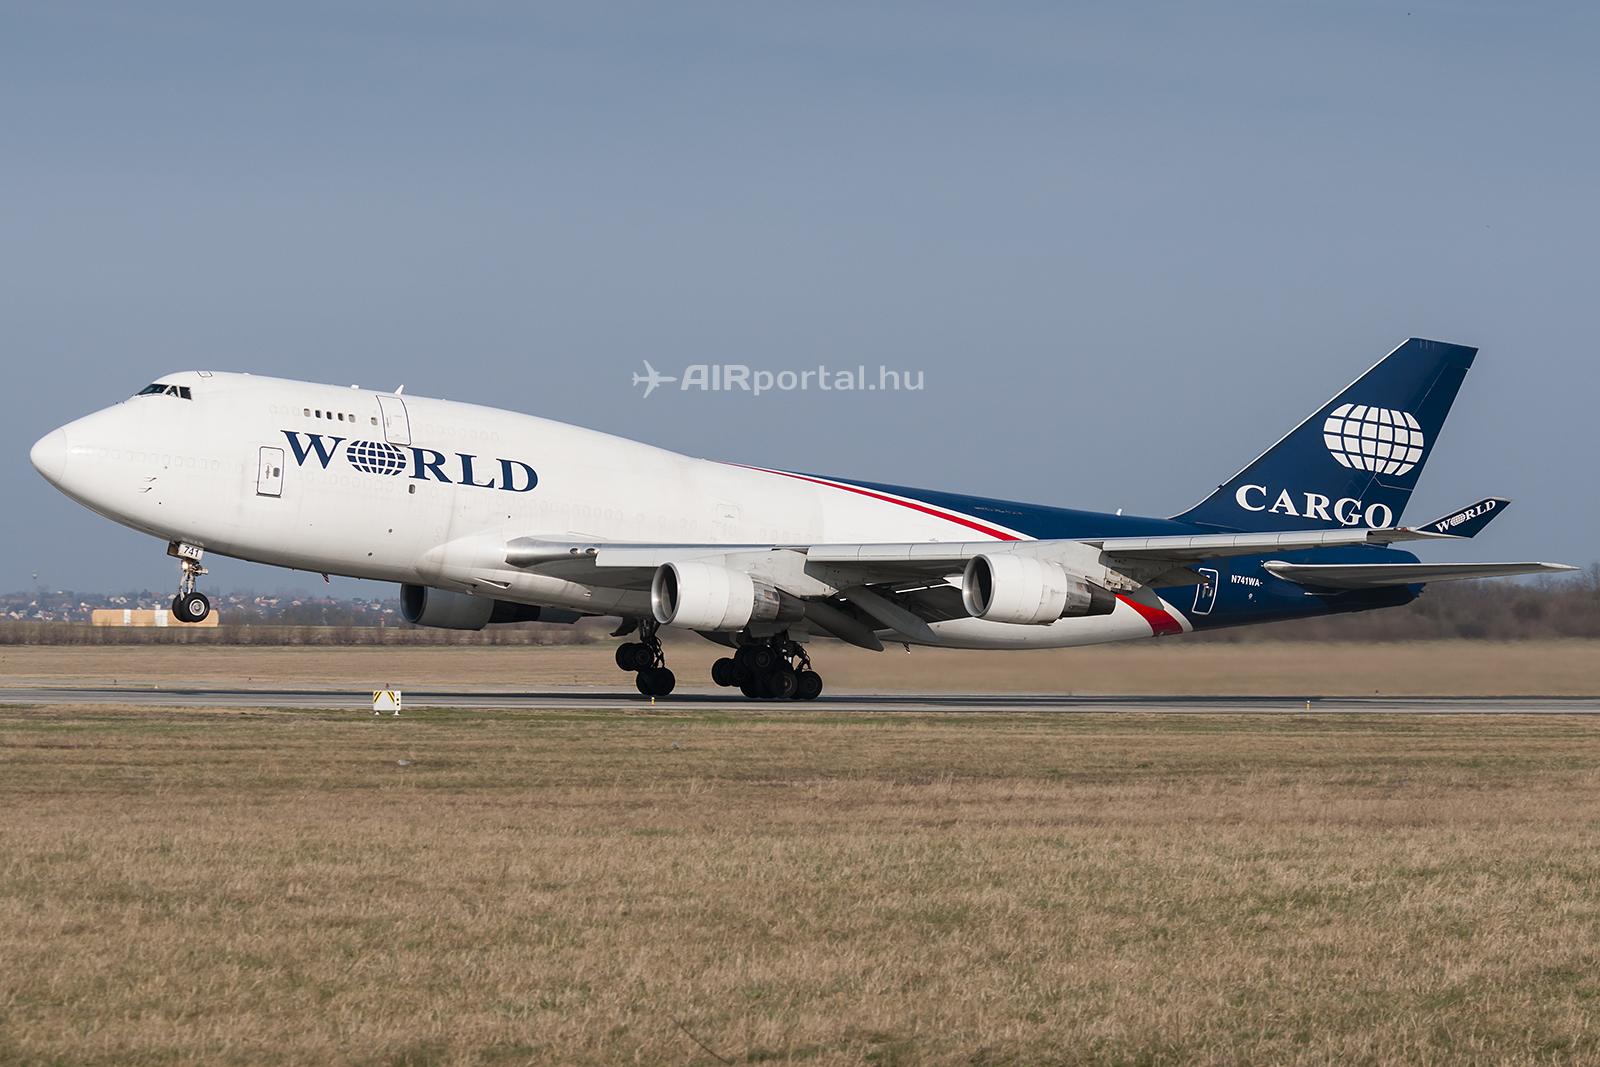 A World Airways Boeing 747-400F repülőgépe Budapesten. ( Fotók: Bodorics Tamás - AIRportal.hu)   © AIRportal.hu